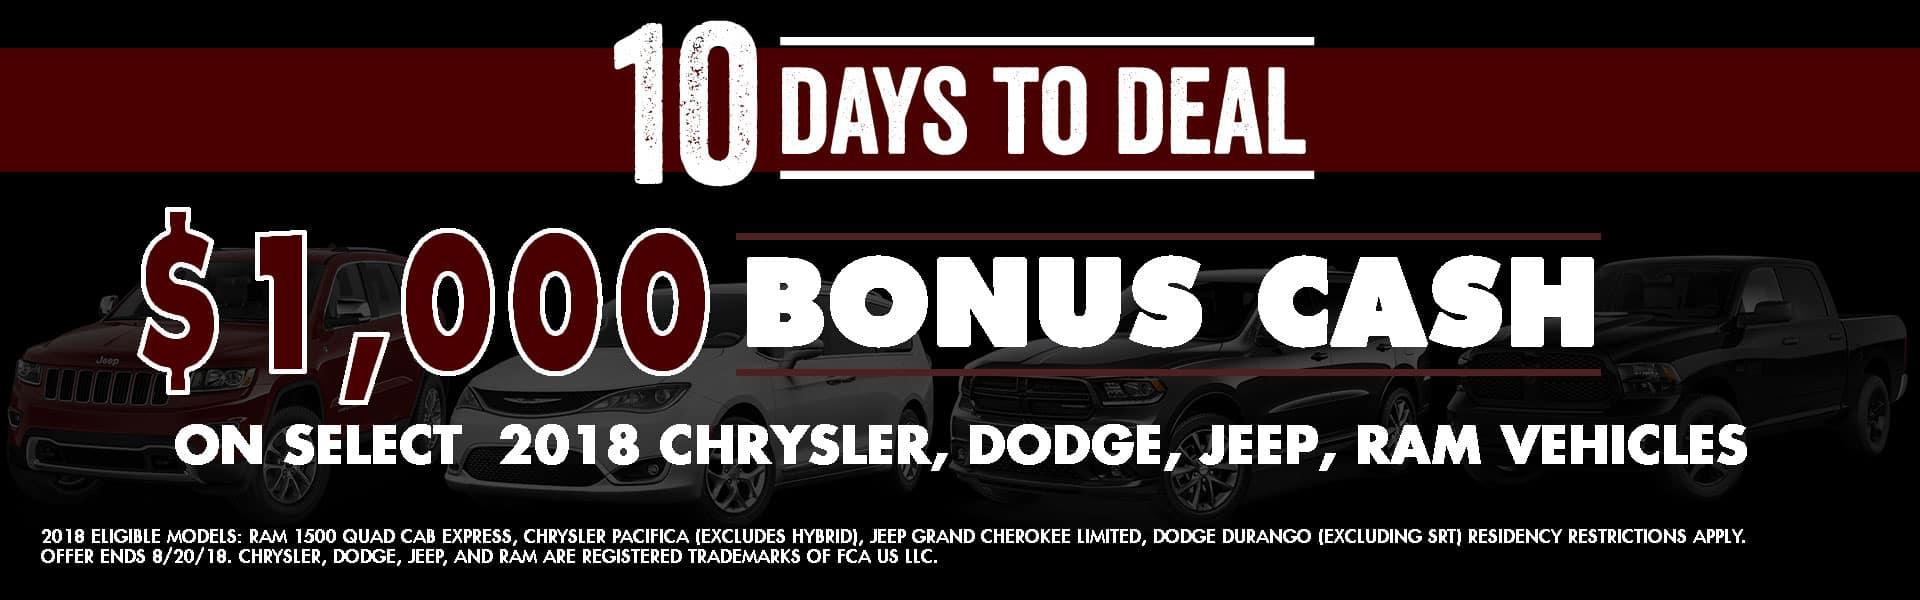 10 days to deal Chrysler dodge jeep ram Diehl of Robinson Robinson Twp, PA Ram, Durango, Pacifica, Grand Cherokee